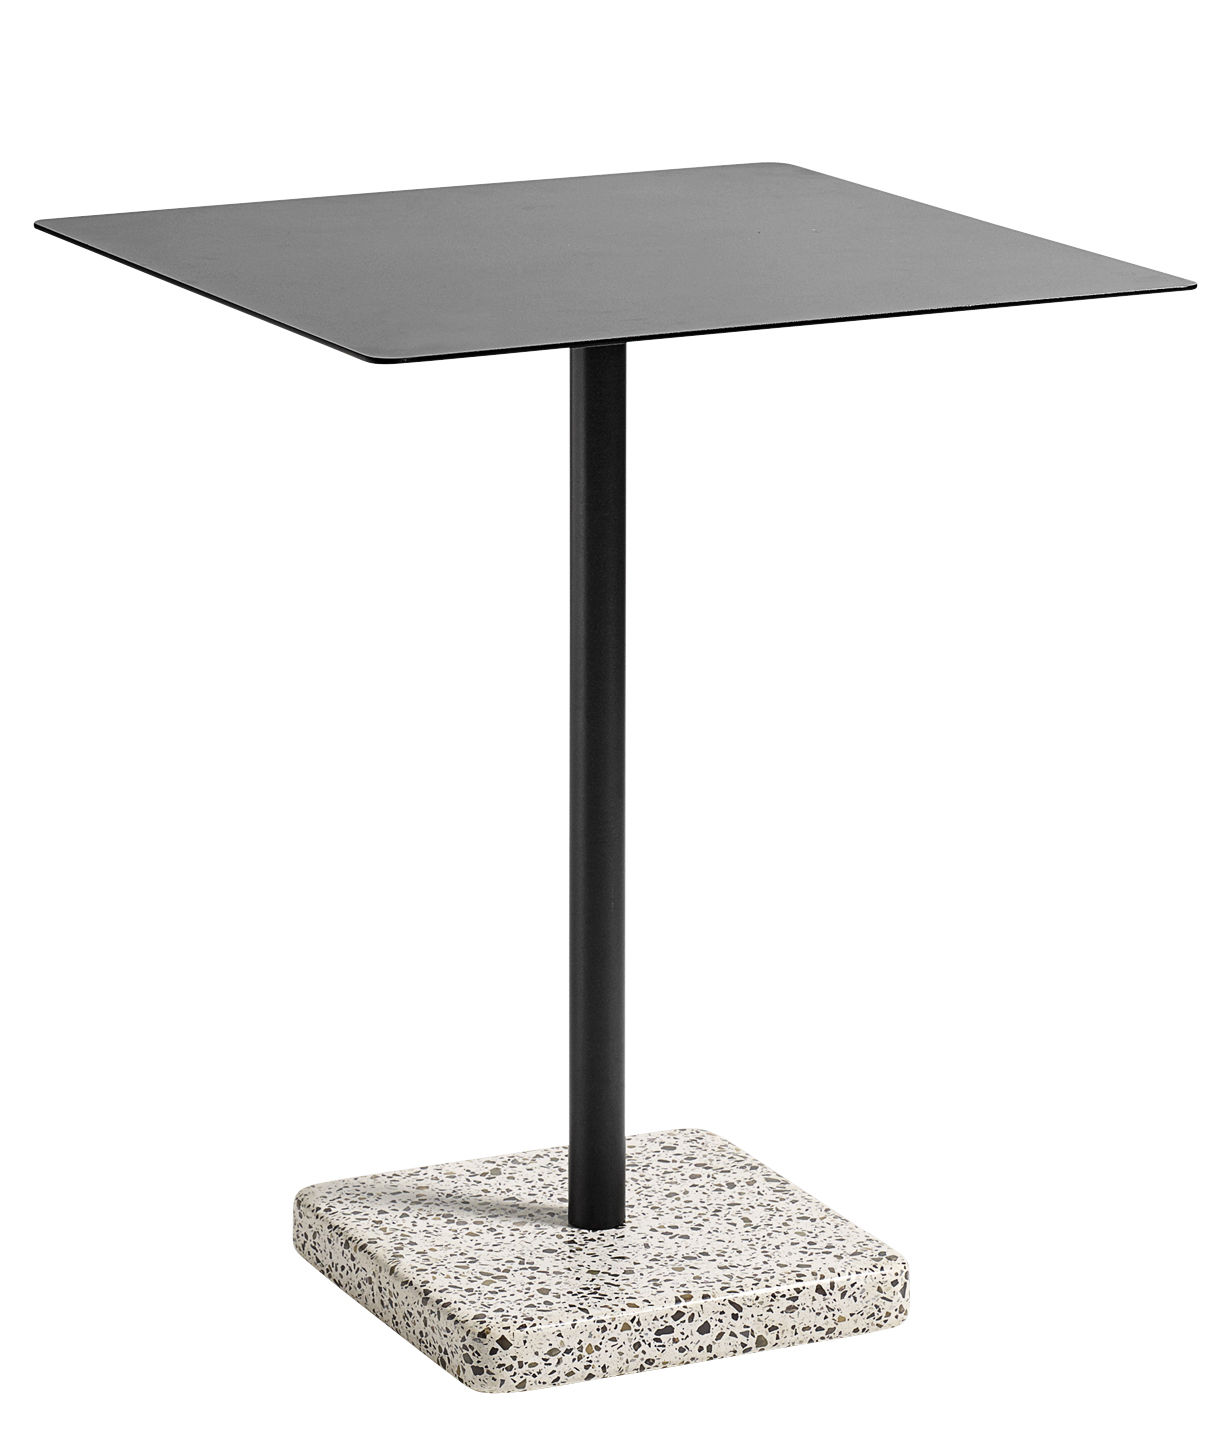 terrazzo 60 x 60 cm hay tisch. Black Bedroom Furniture Sets. Home Design Ideas